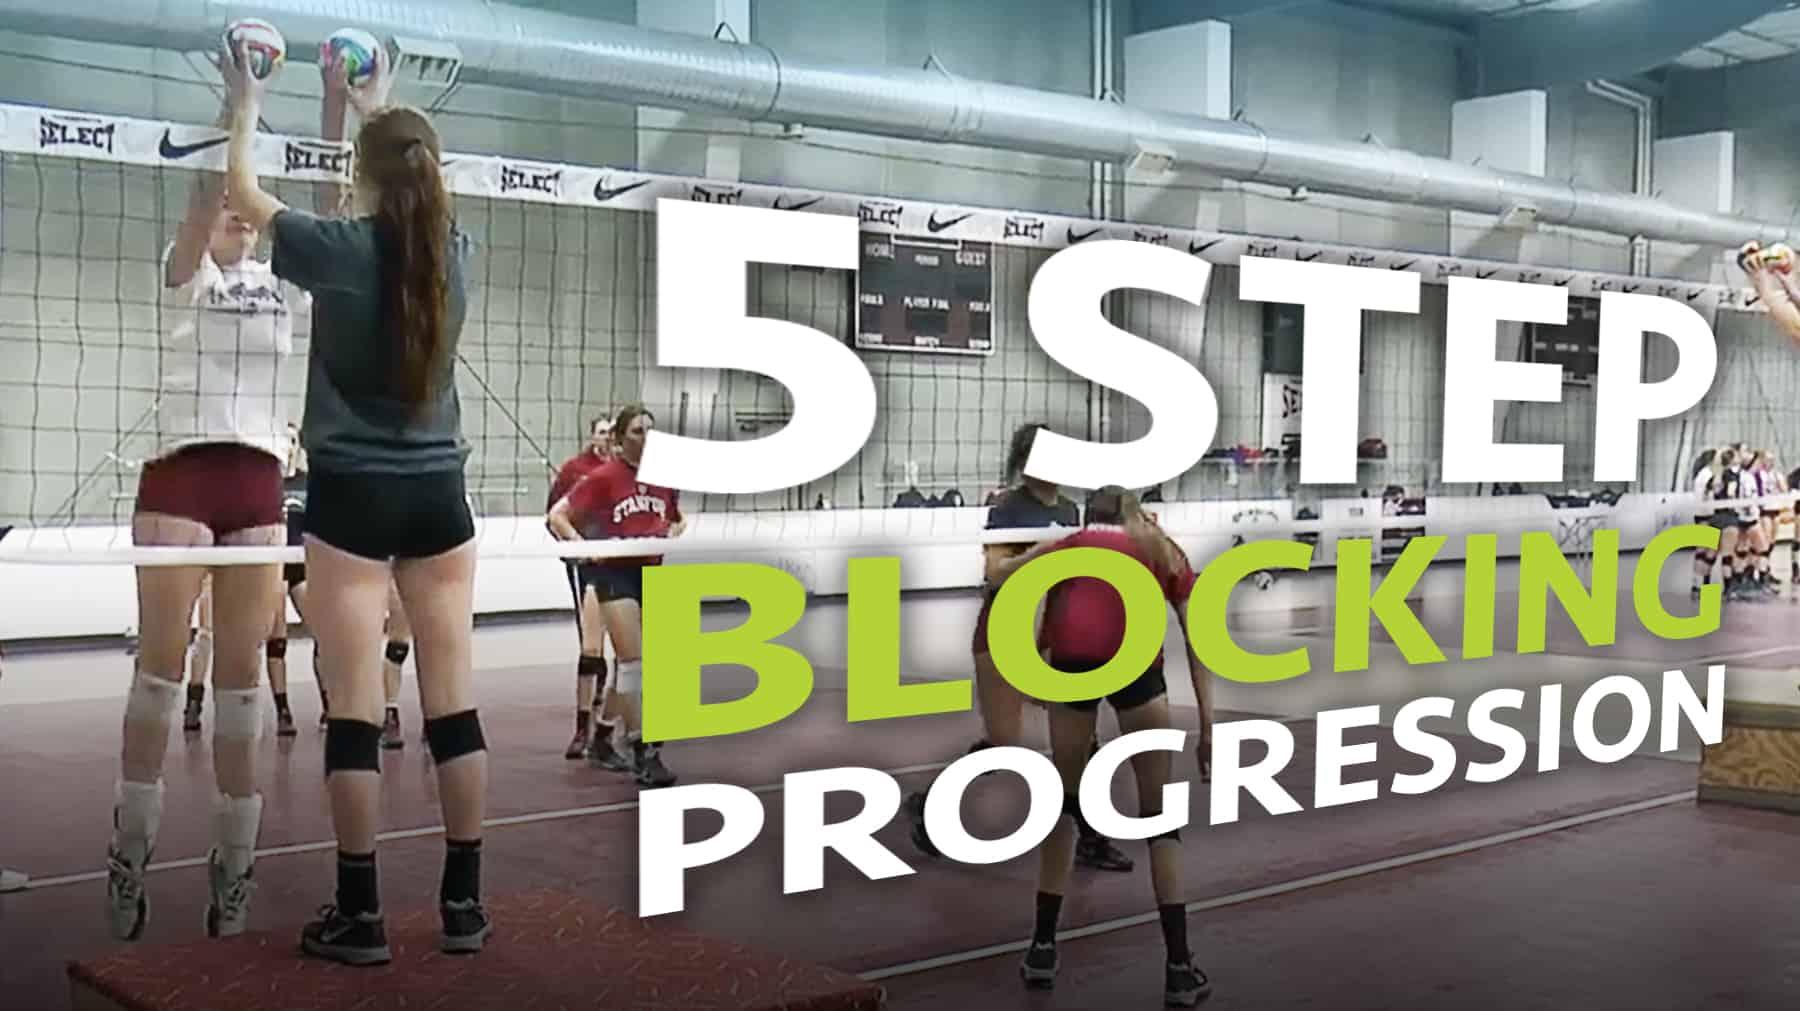 Joy Tietz Five Step Blocking Progression